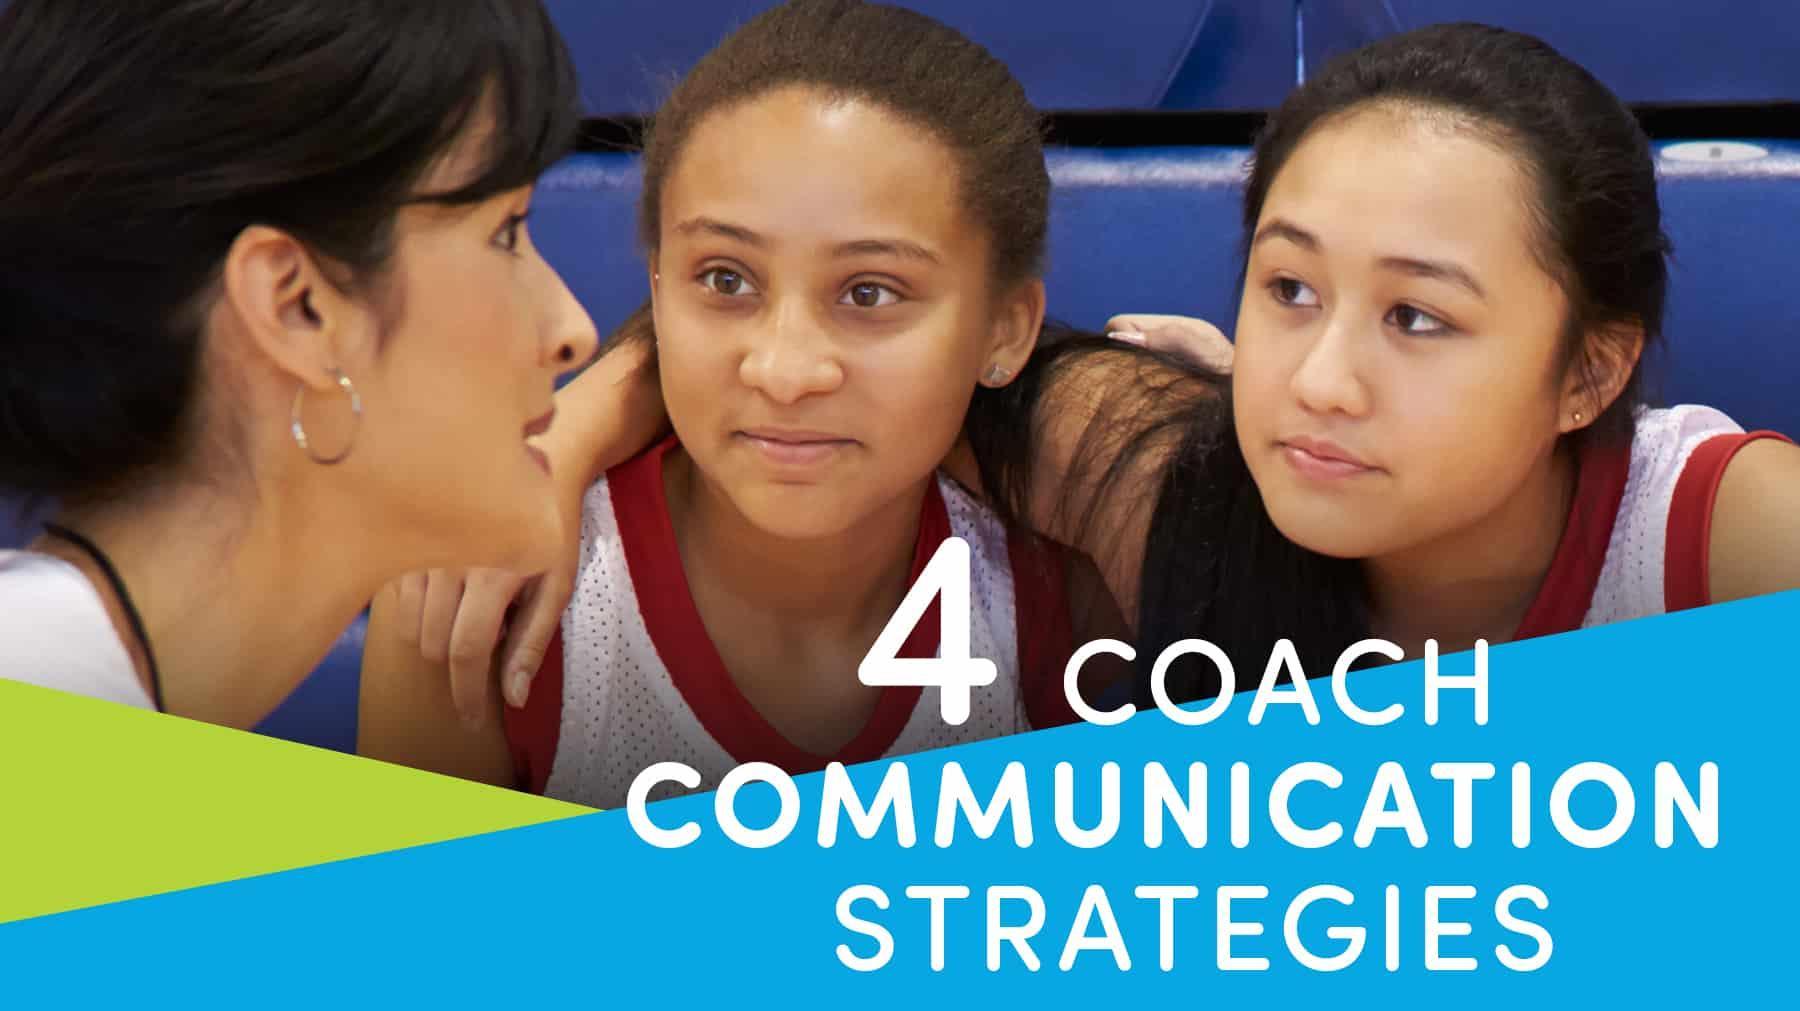 4 coach communication strategies